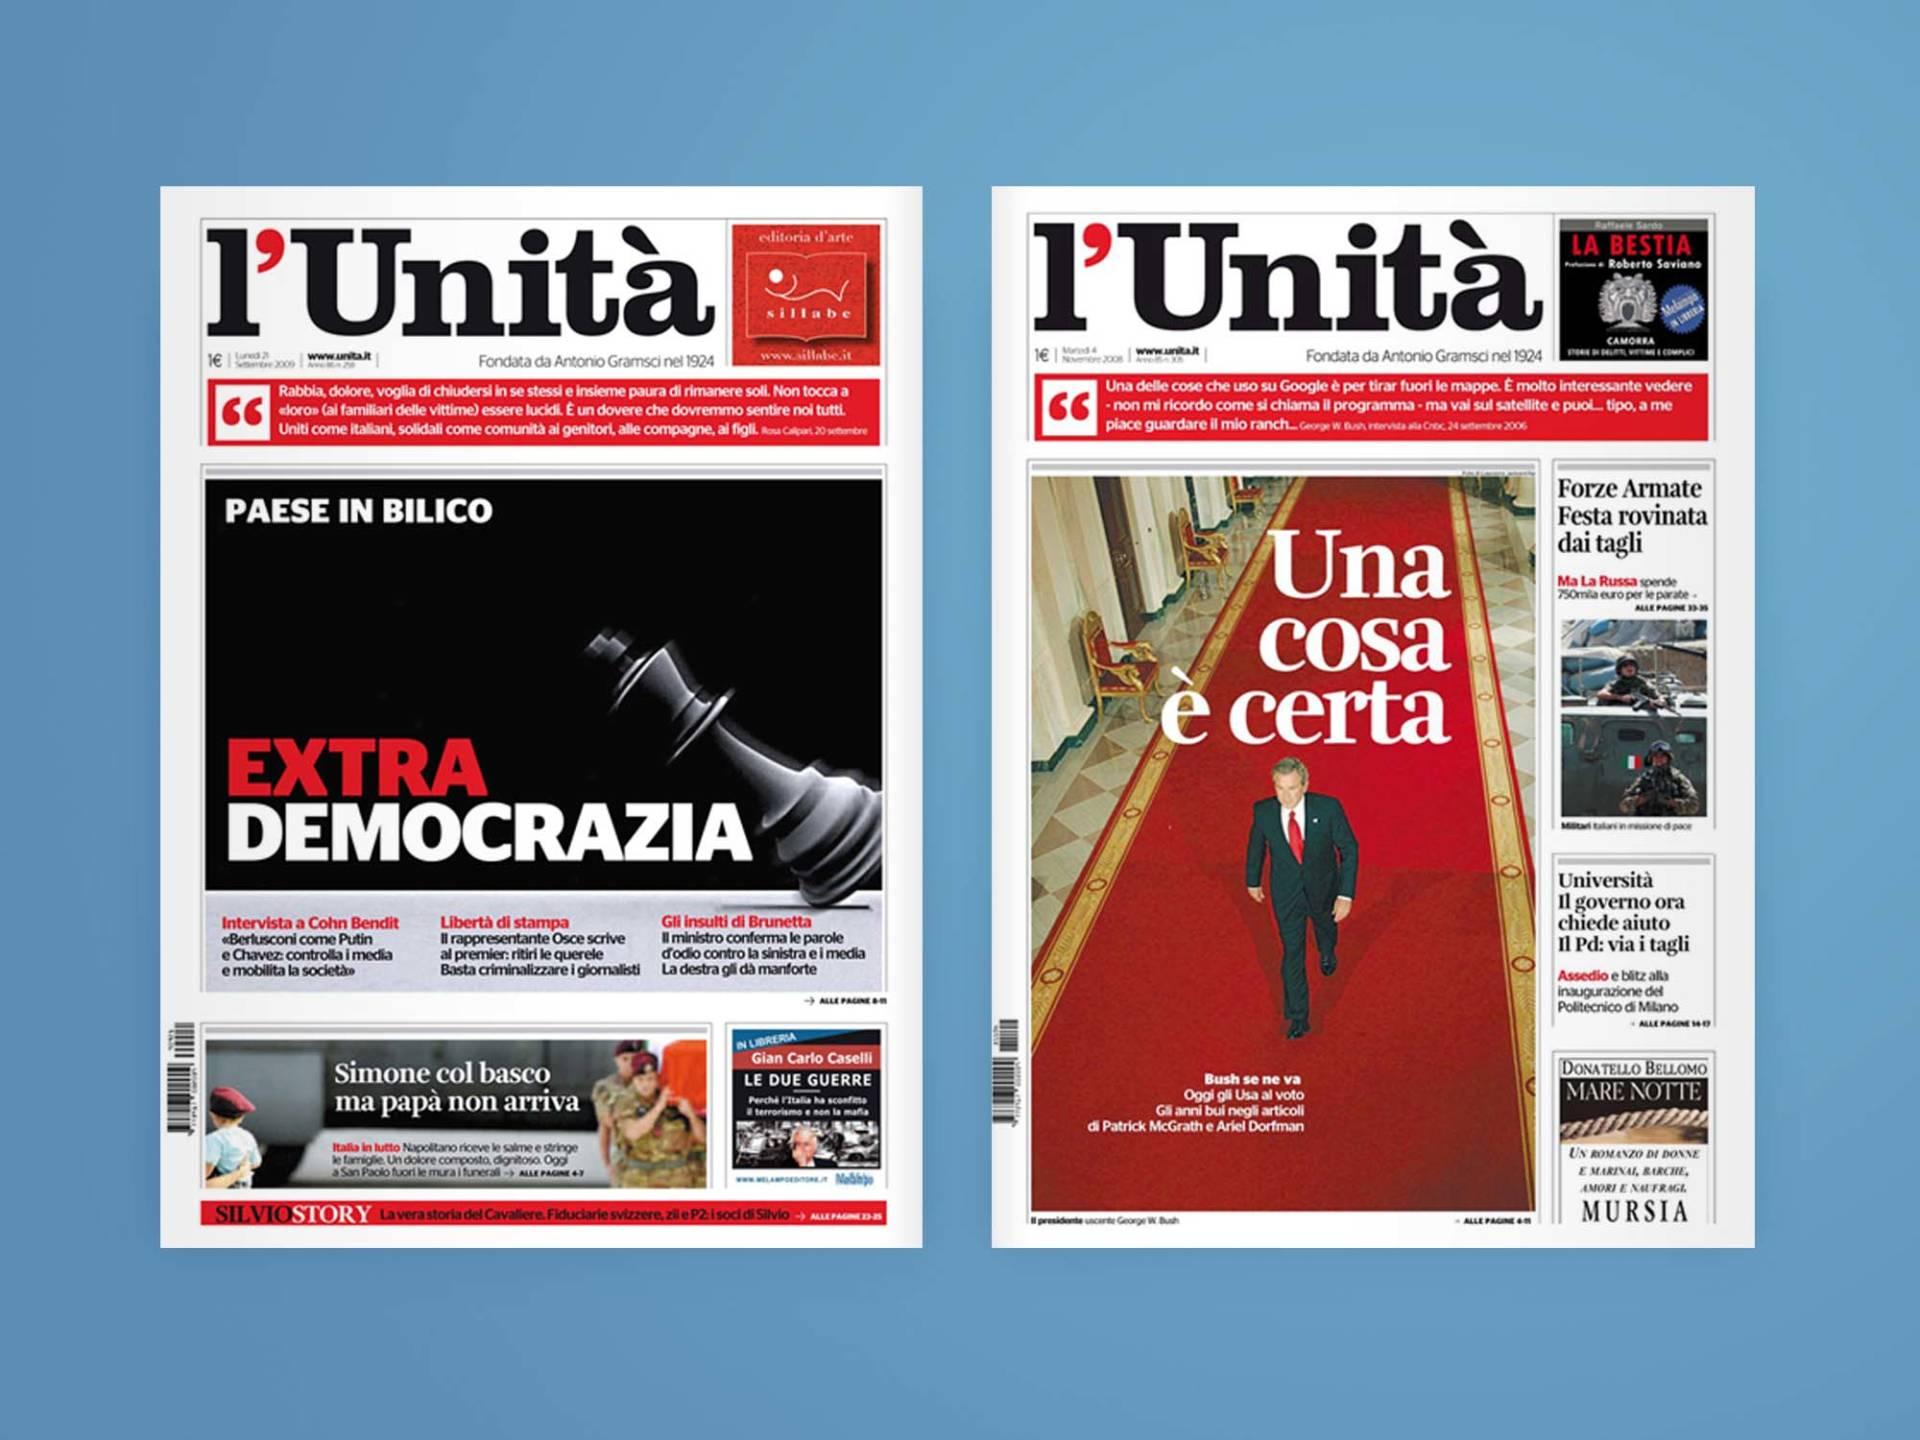 L'Unità_02_Wenceslau_News_Design